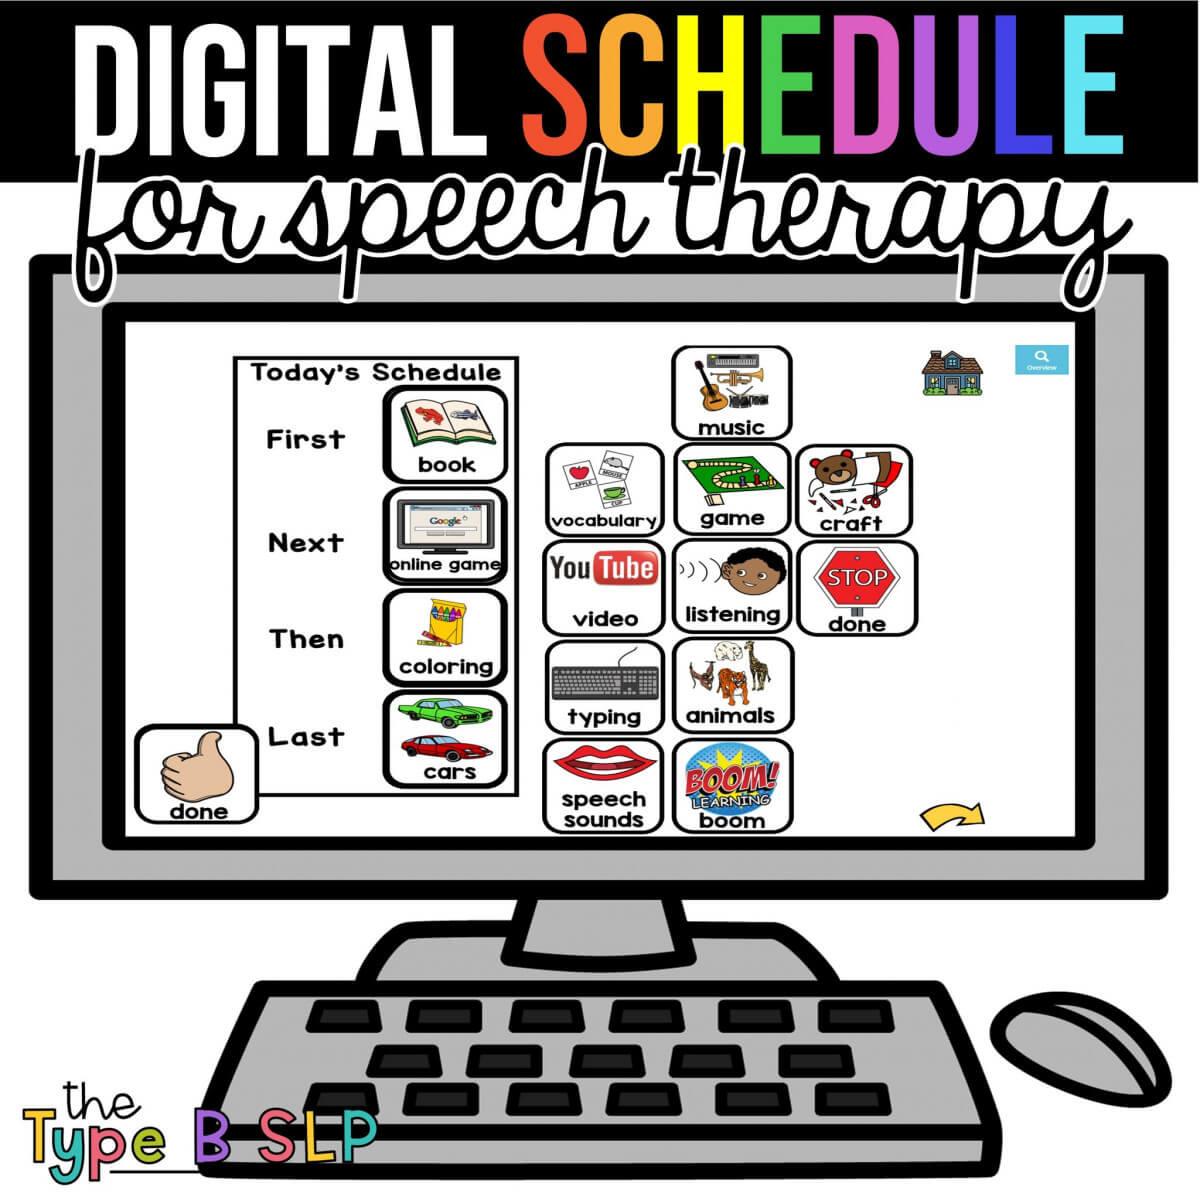 digital schedule